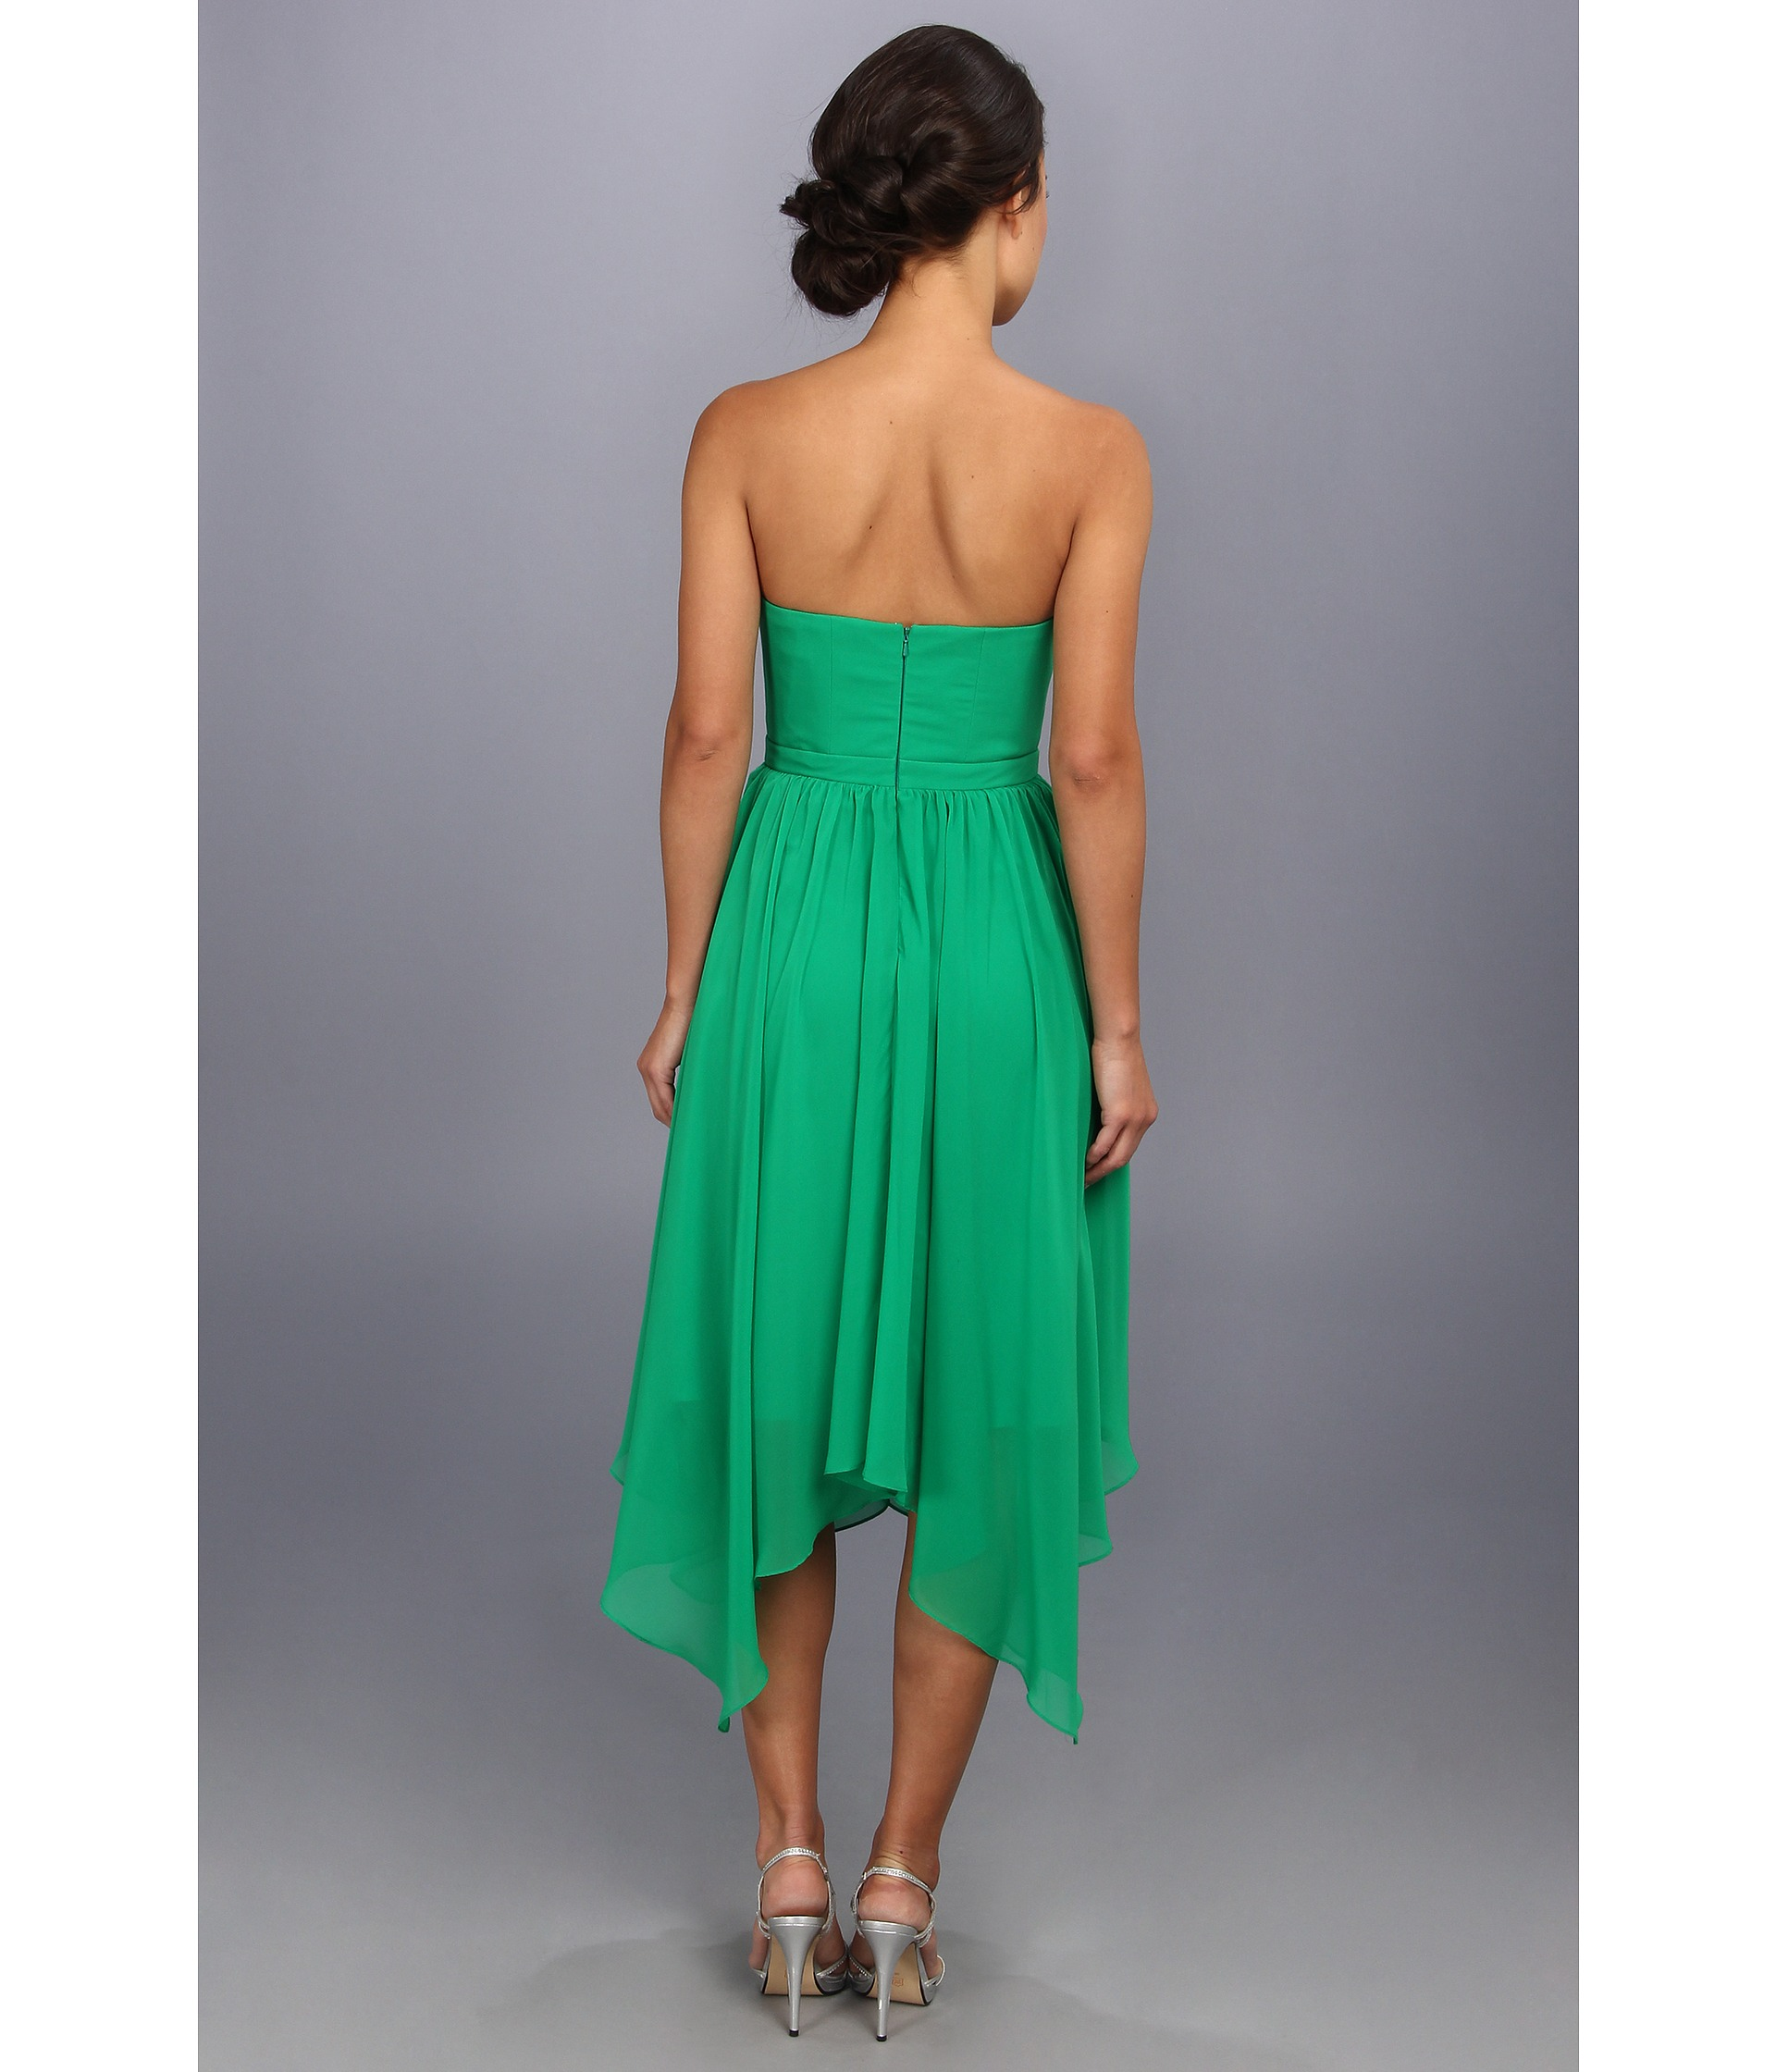 Cocktail Dresses With Handkerchief Hemline 27